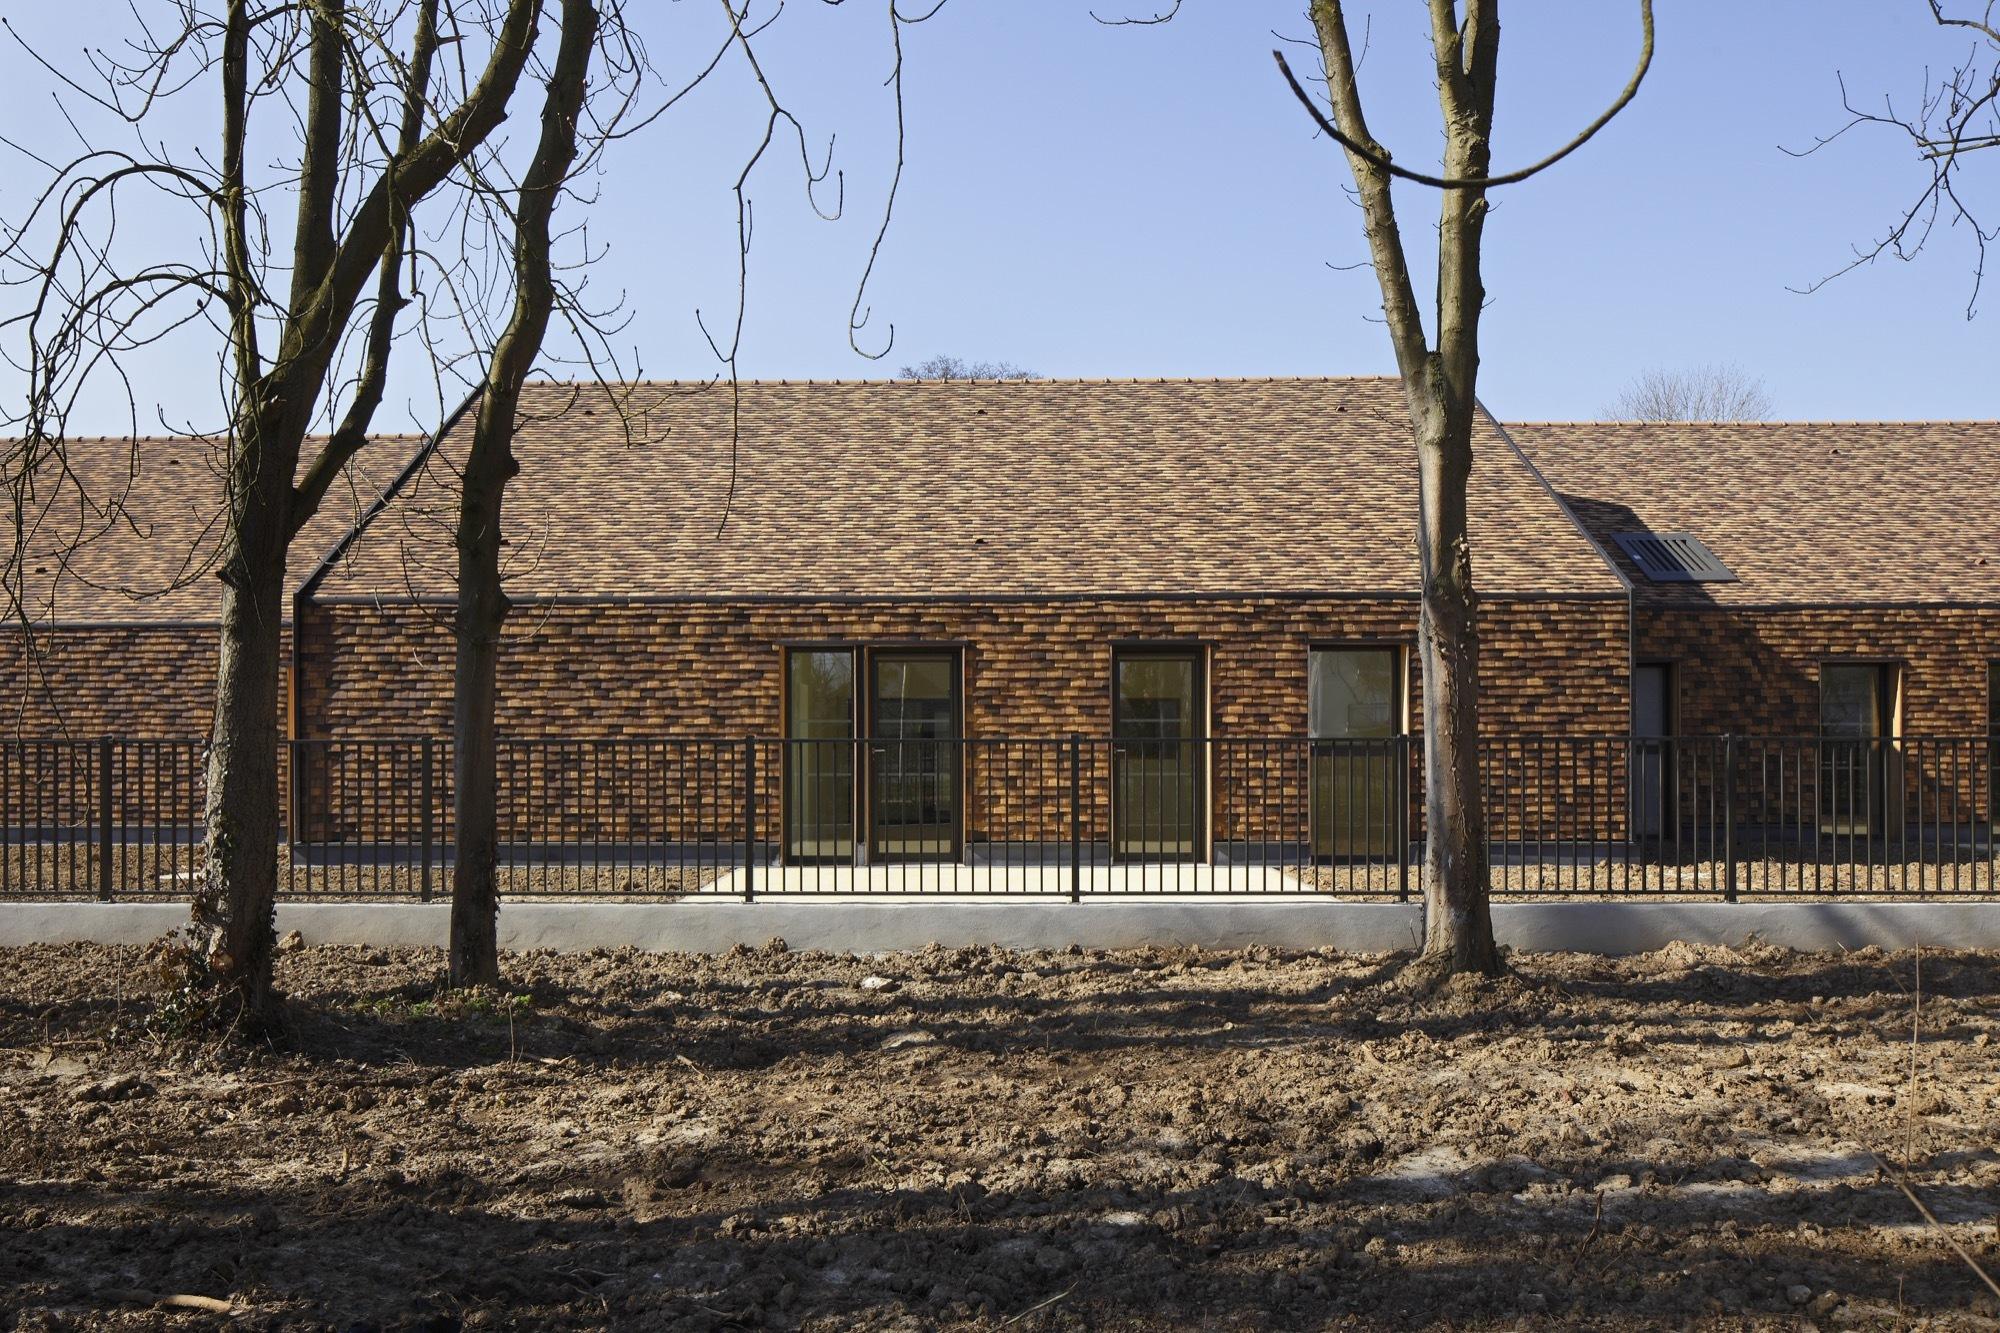 Gallery of maison de l enfance nomade architectes 5 for Architecture nomade